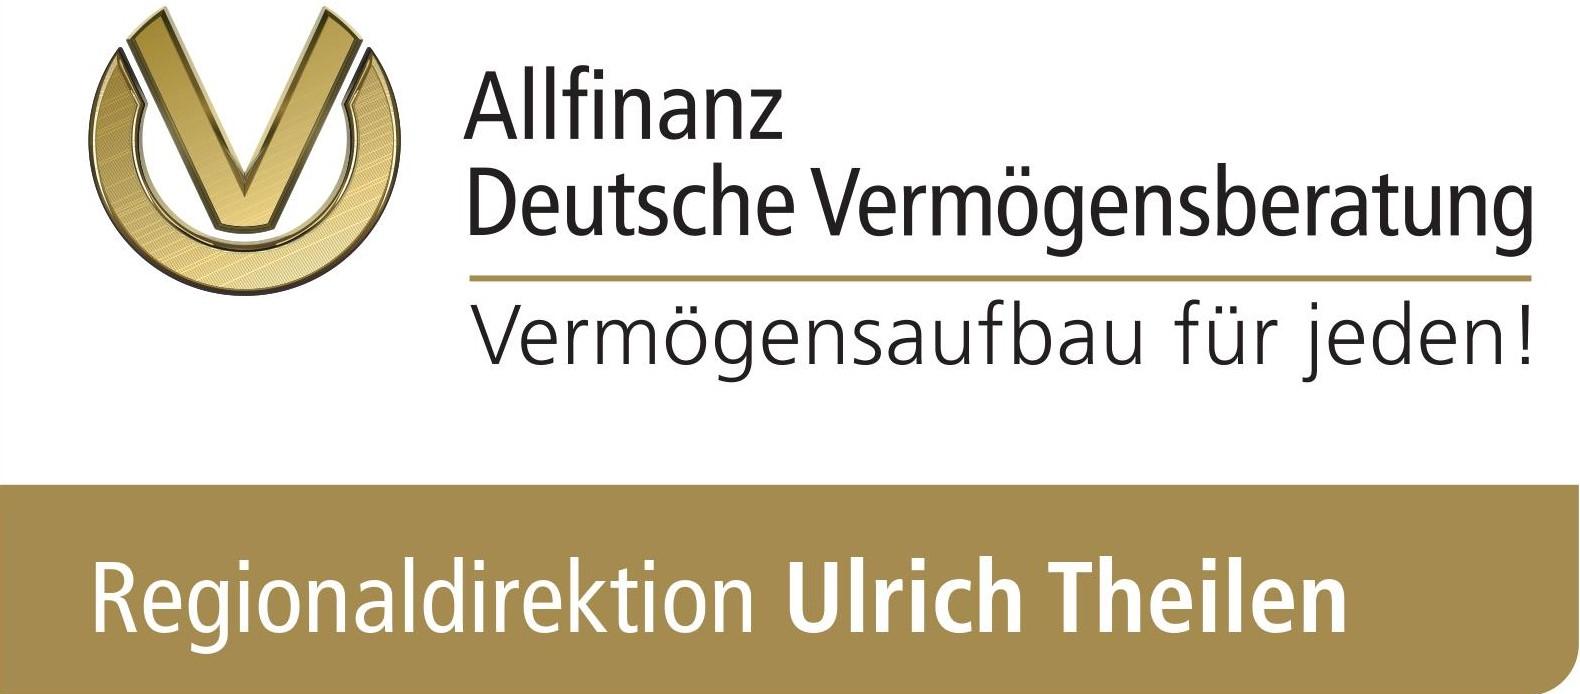 Deutsche Vermögensberatung